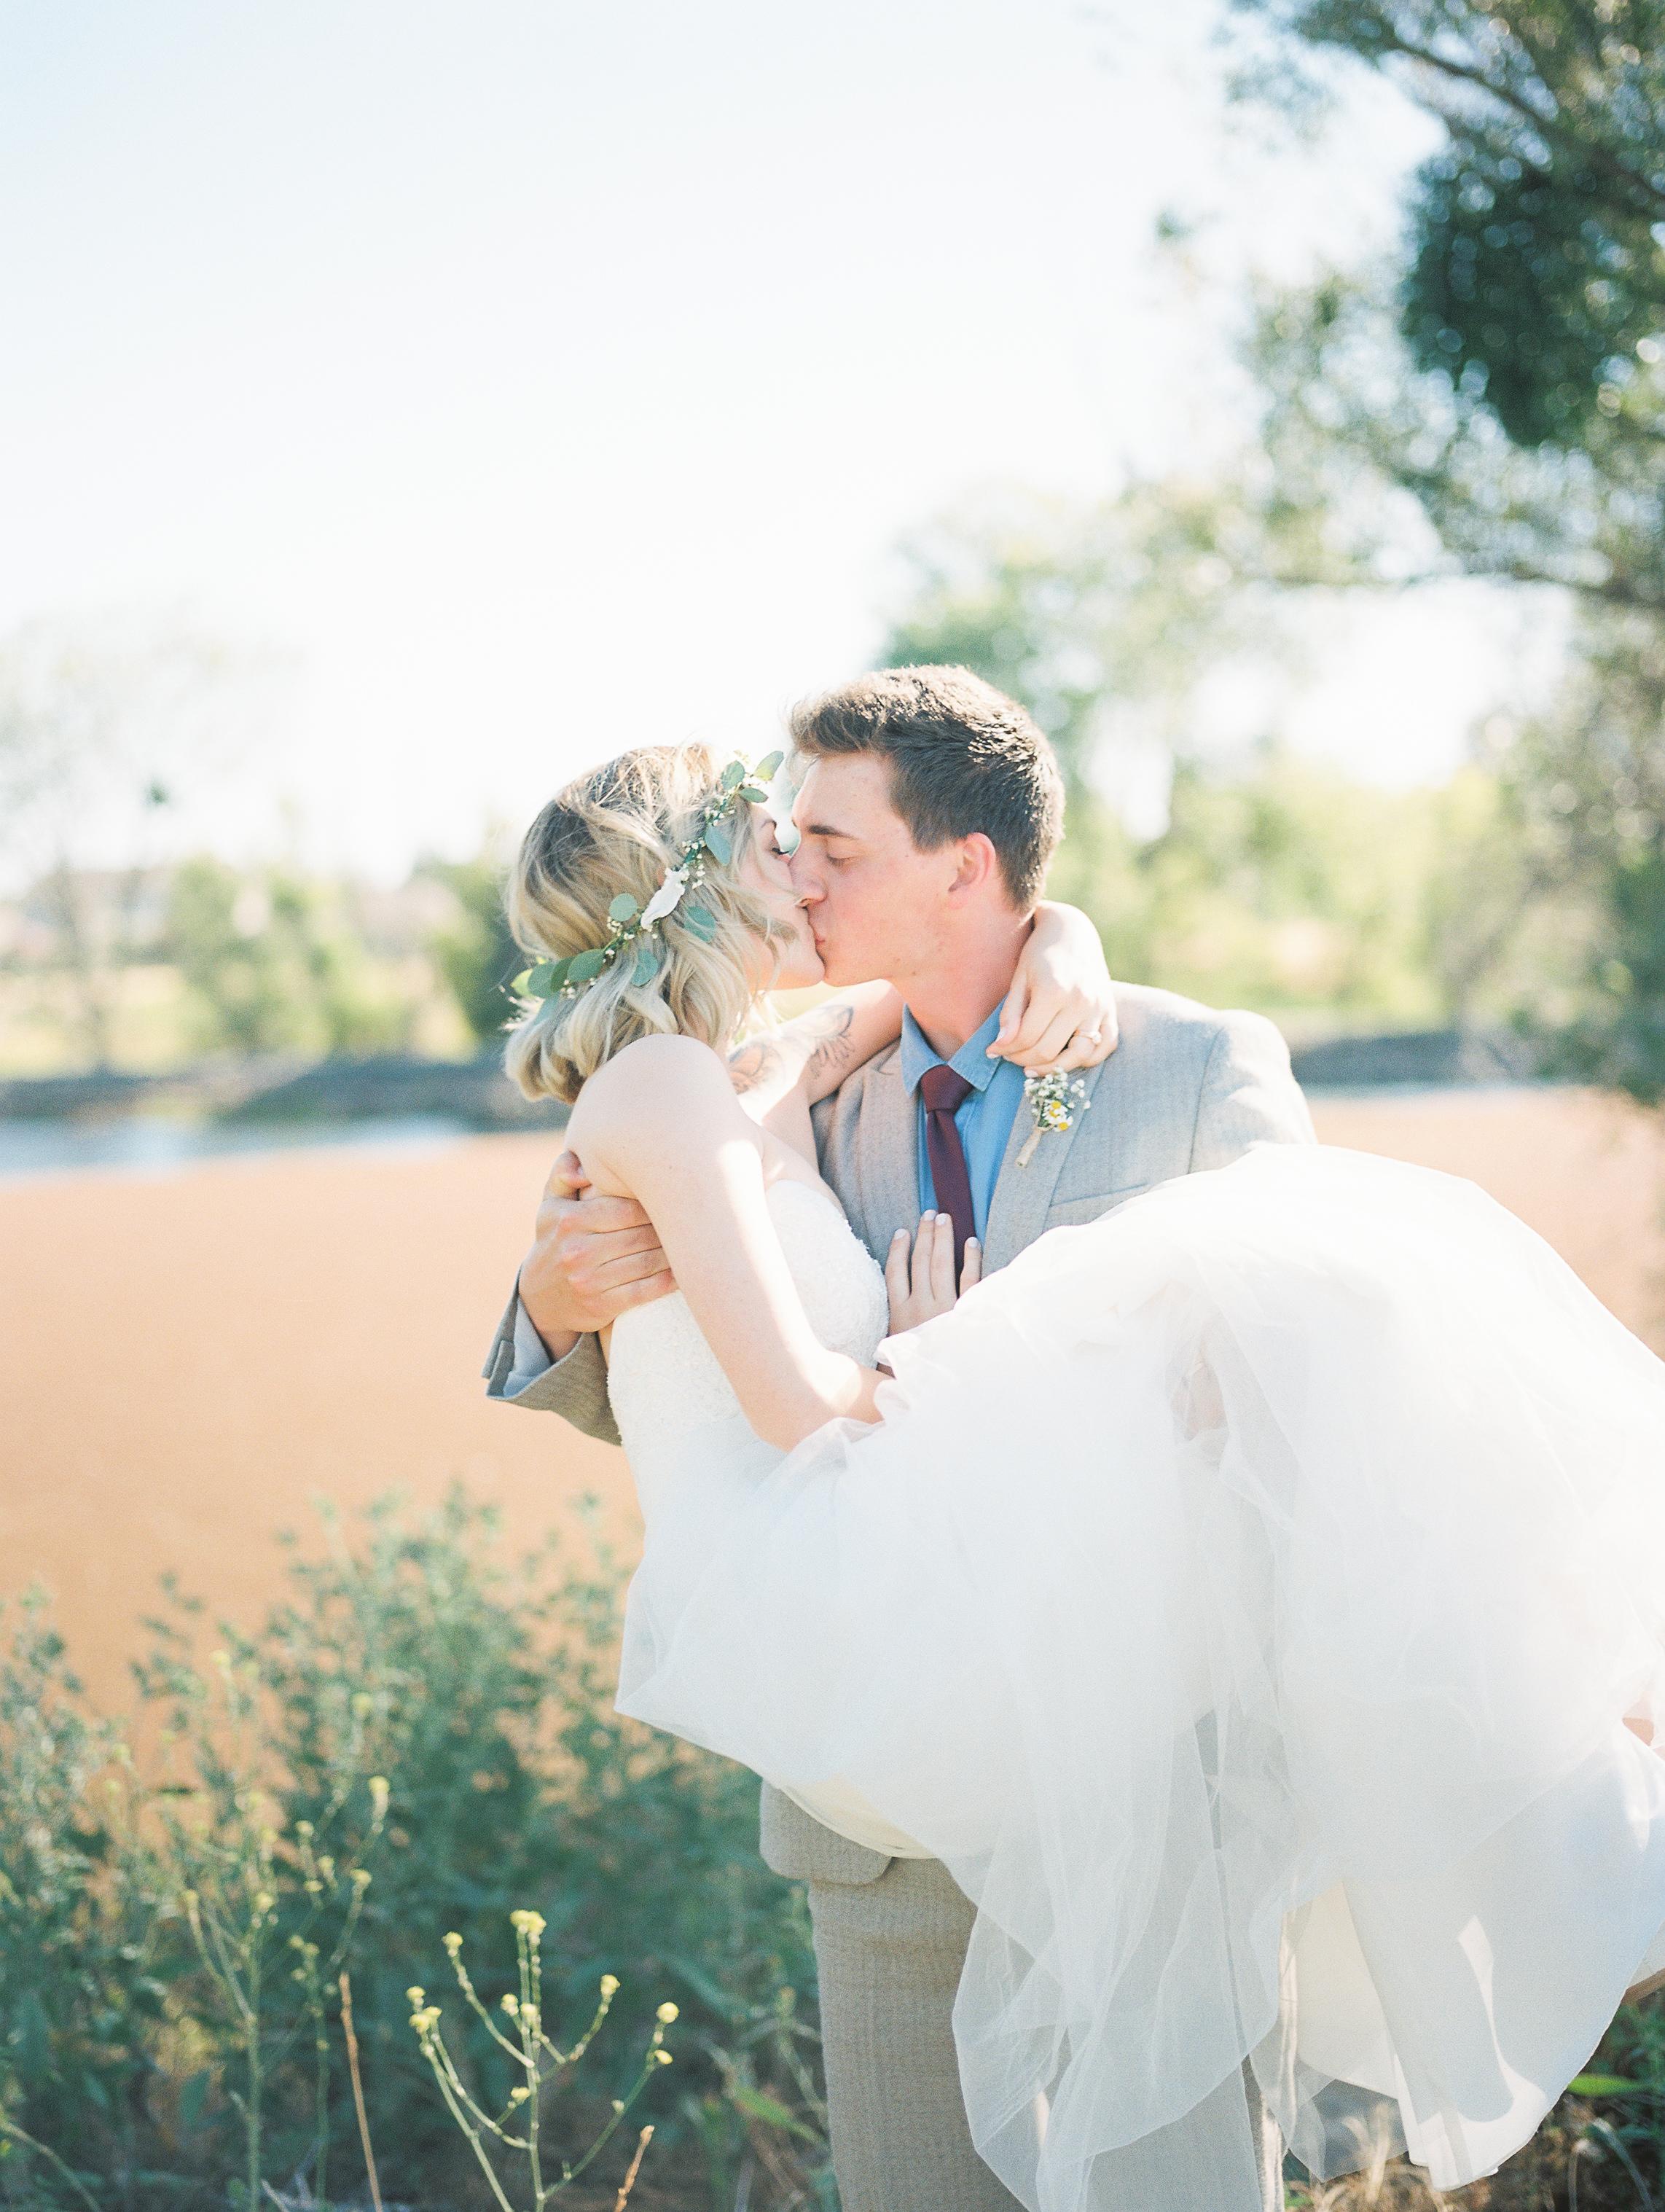 clayton+kennedy-married-filmscans-16.jpg